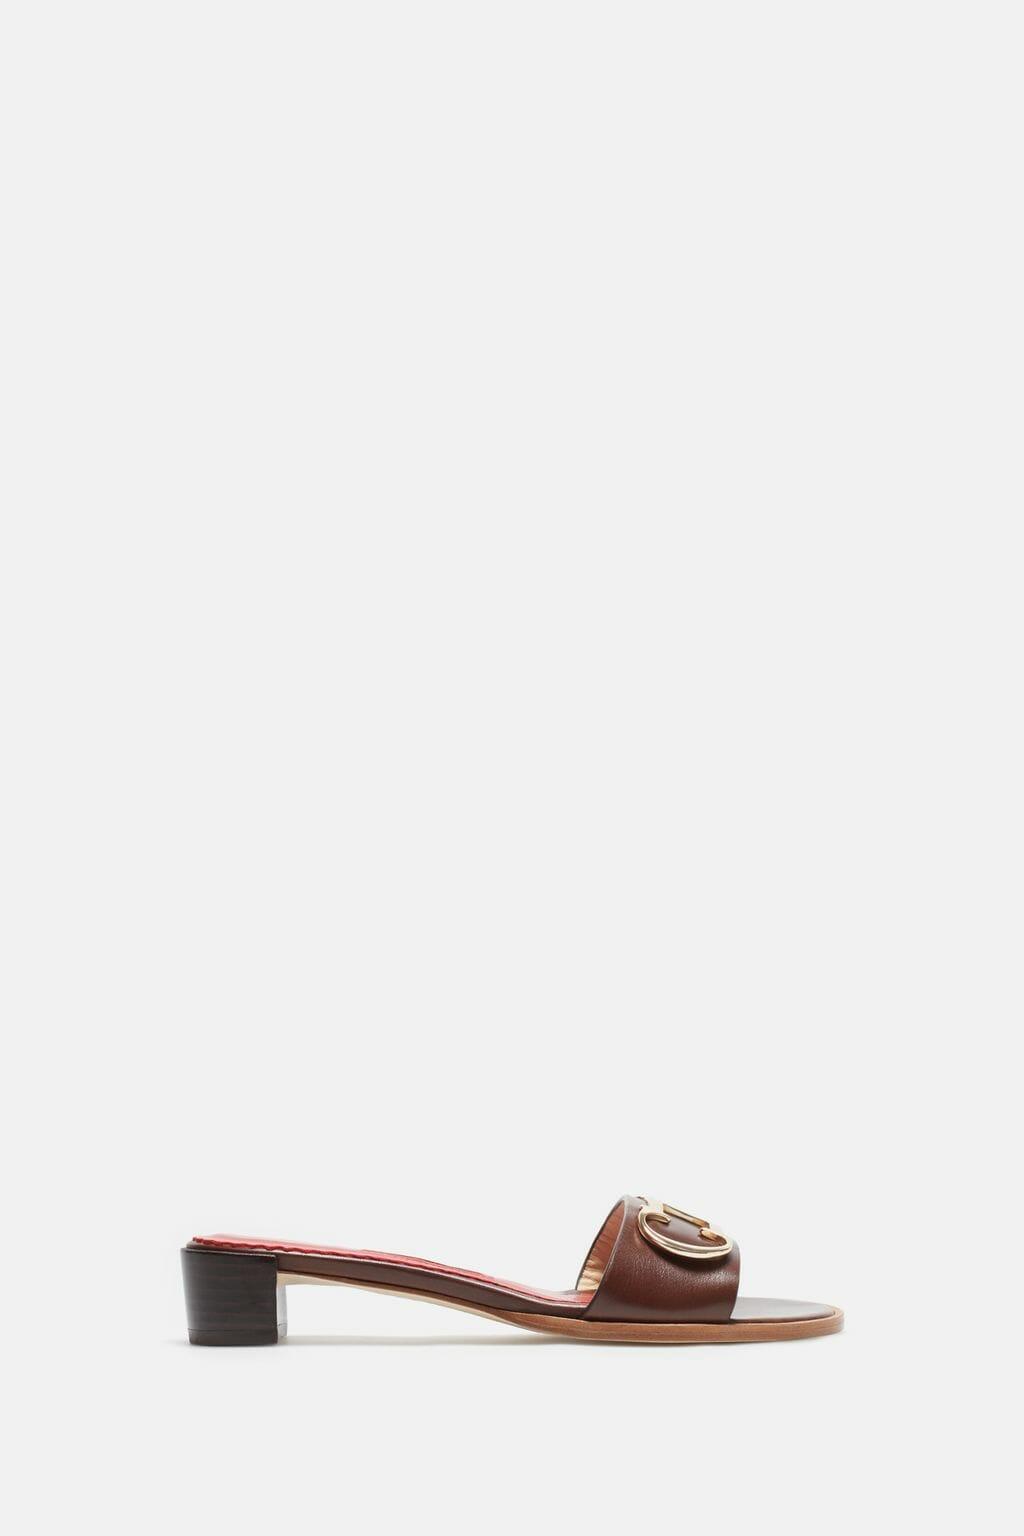 CH-Carolina-herrera-shoes-collection-Spring-Summer-2018-shoe-40